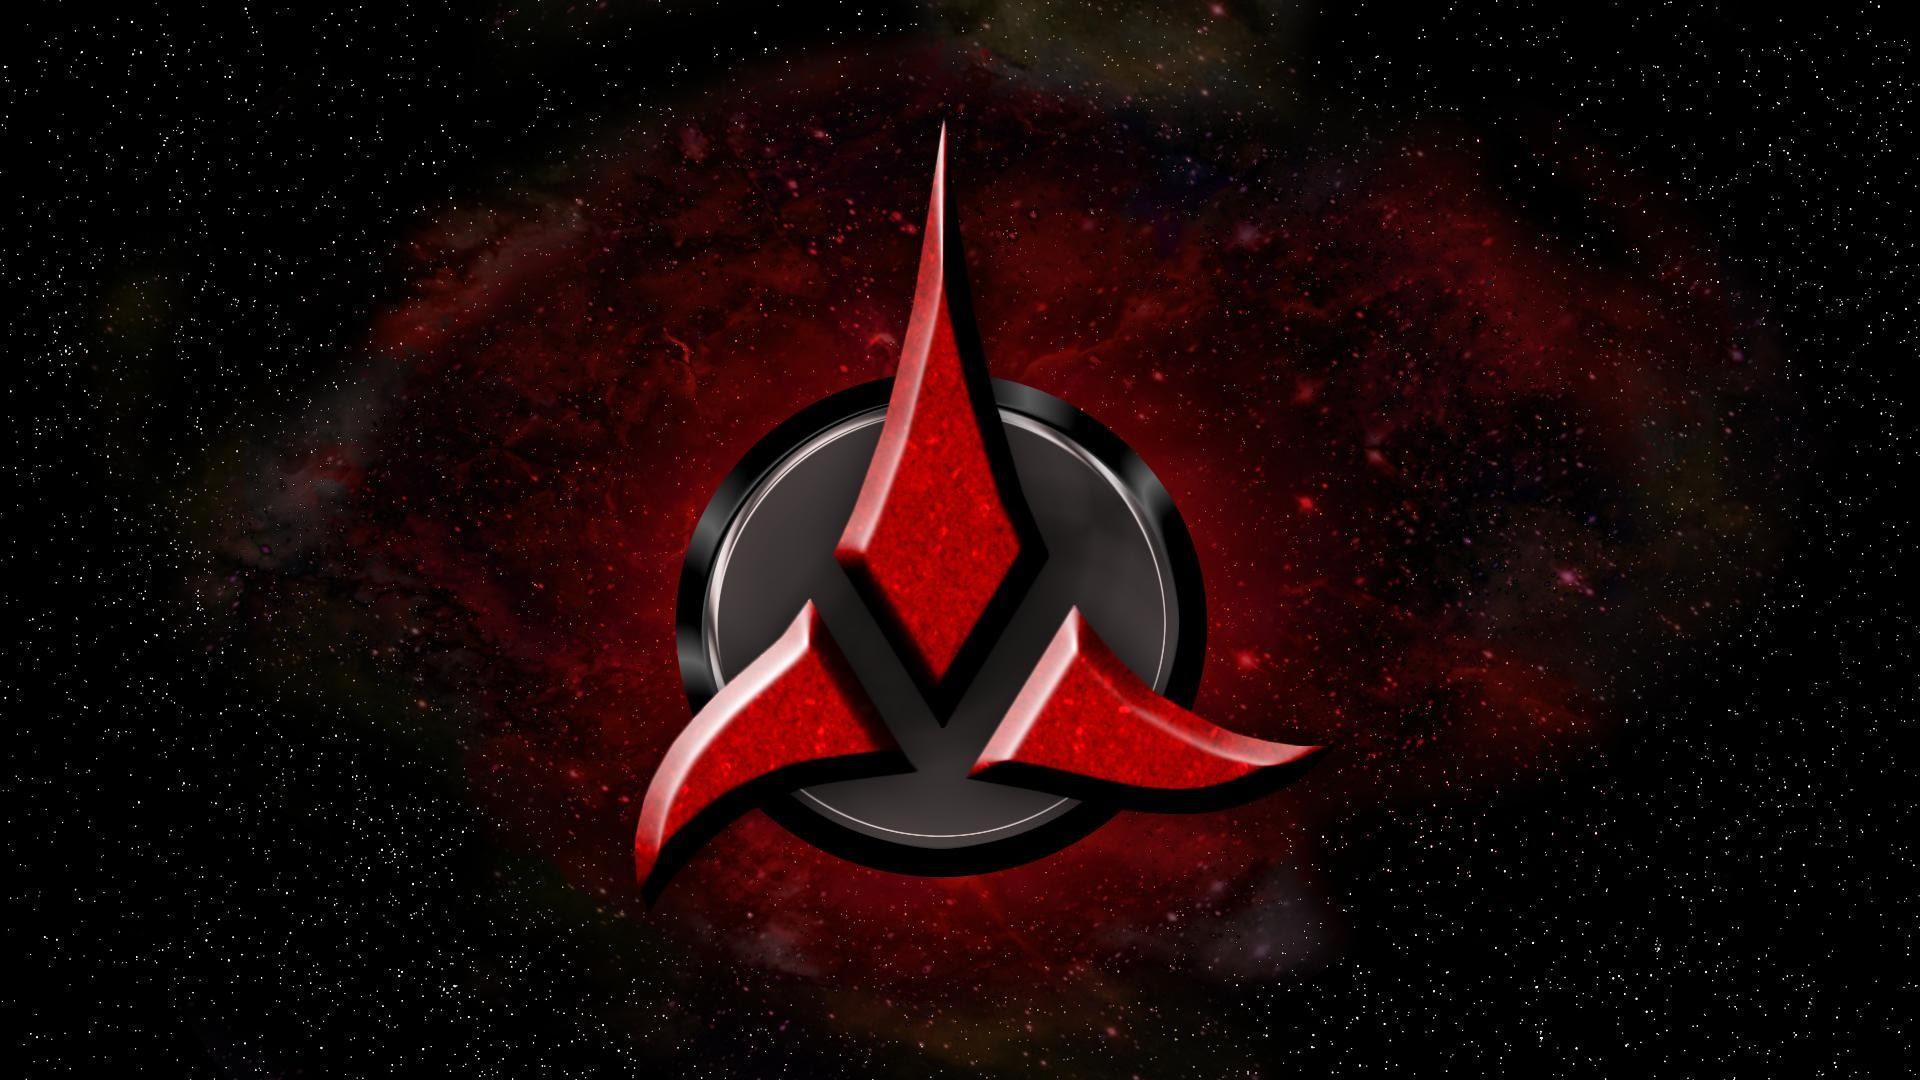 Klingon Symbol Wallpaper 81 Images